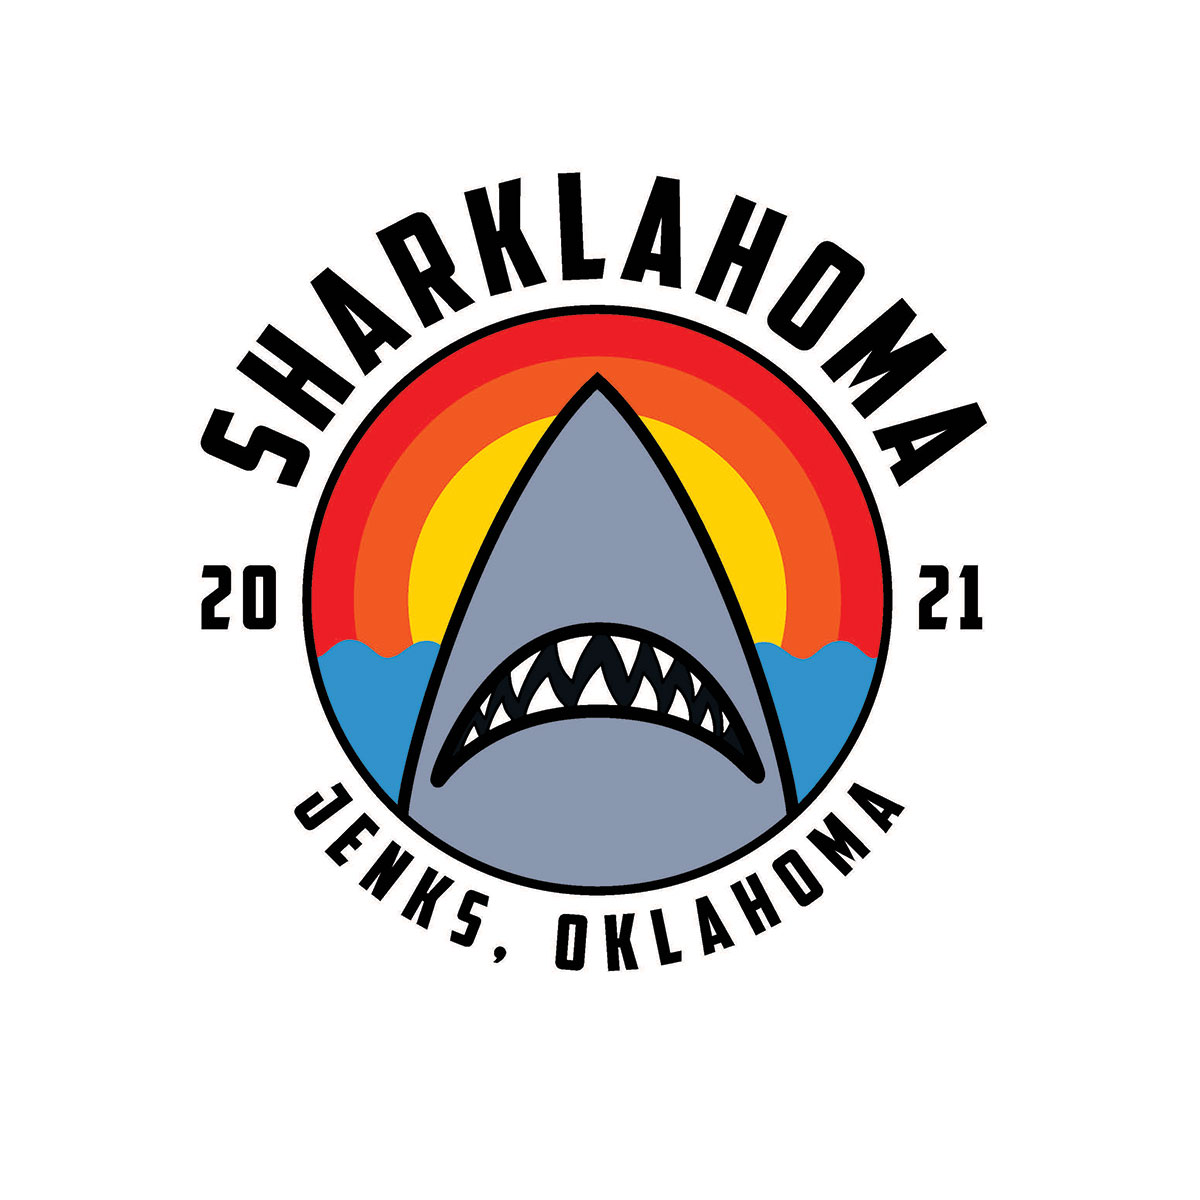 A logo for Jenks' month-long Sharklahoma celebration